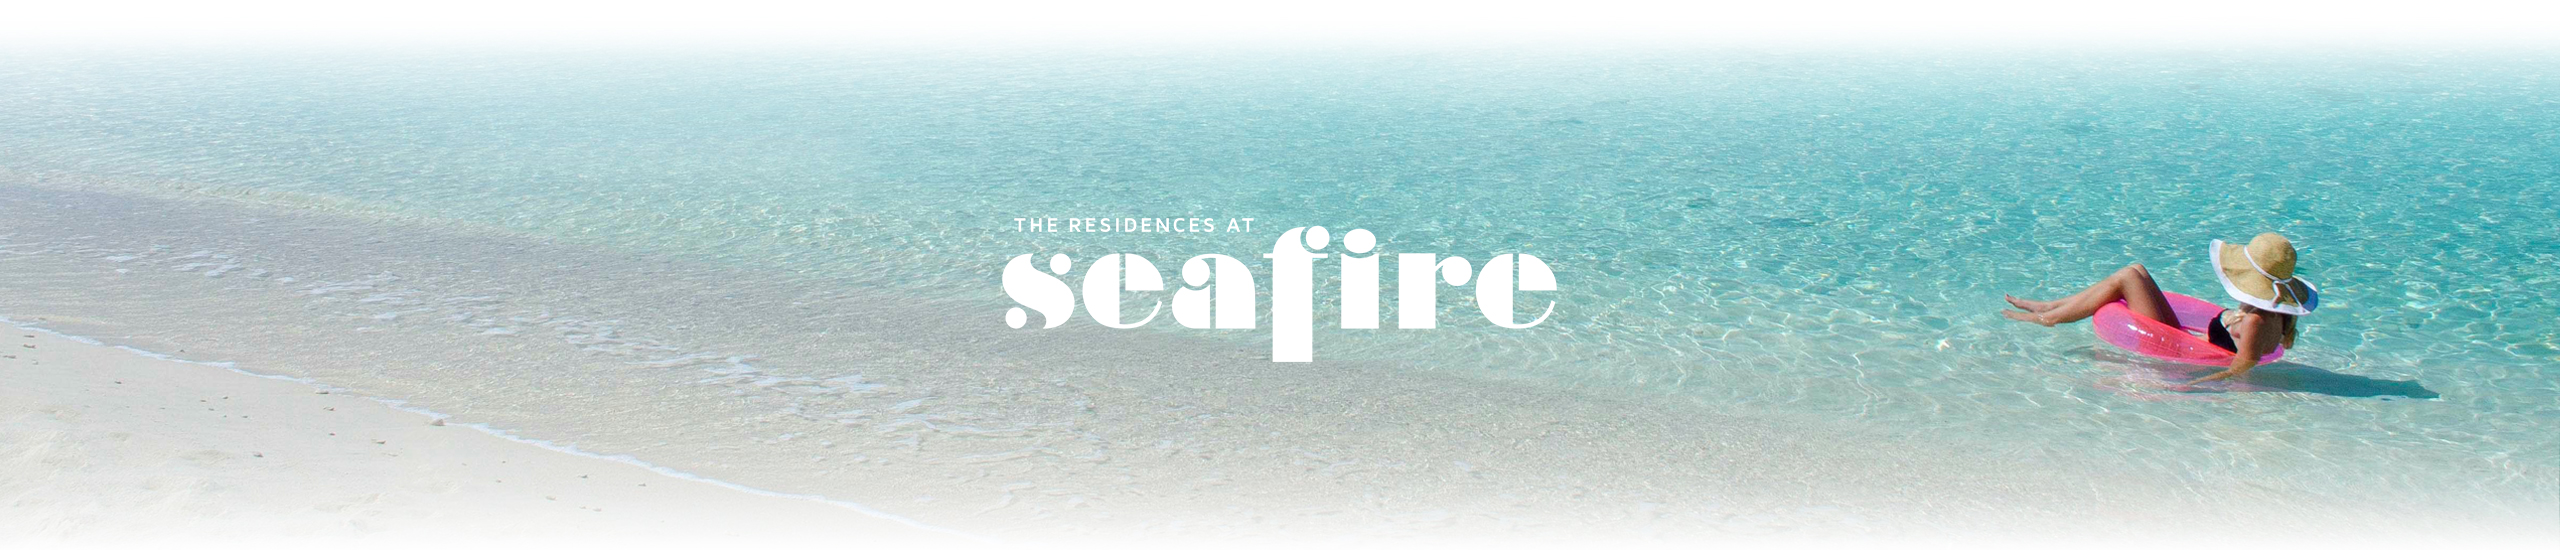 Seafire Grand Cayman